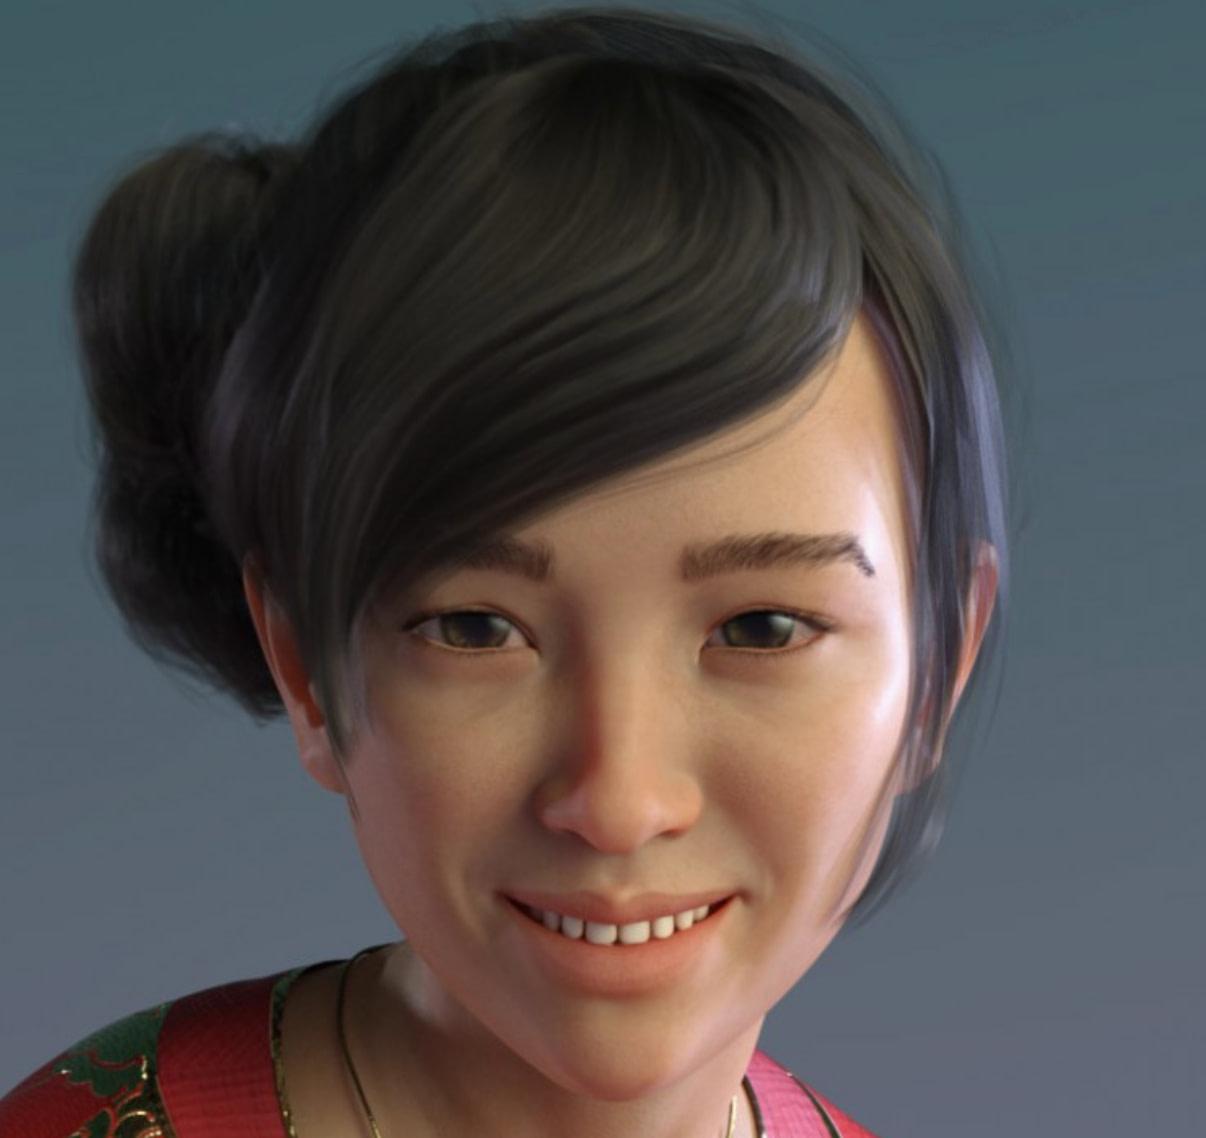 qx eu meh daz asian female